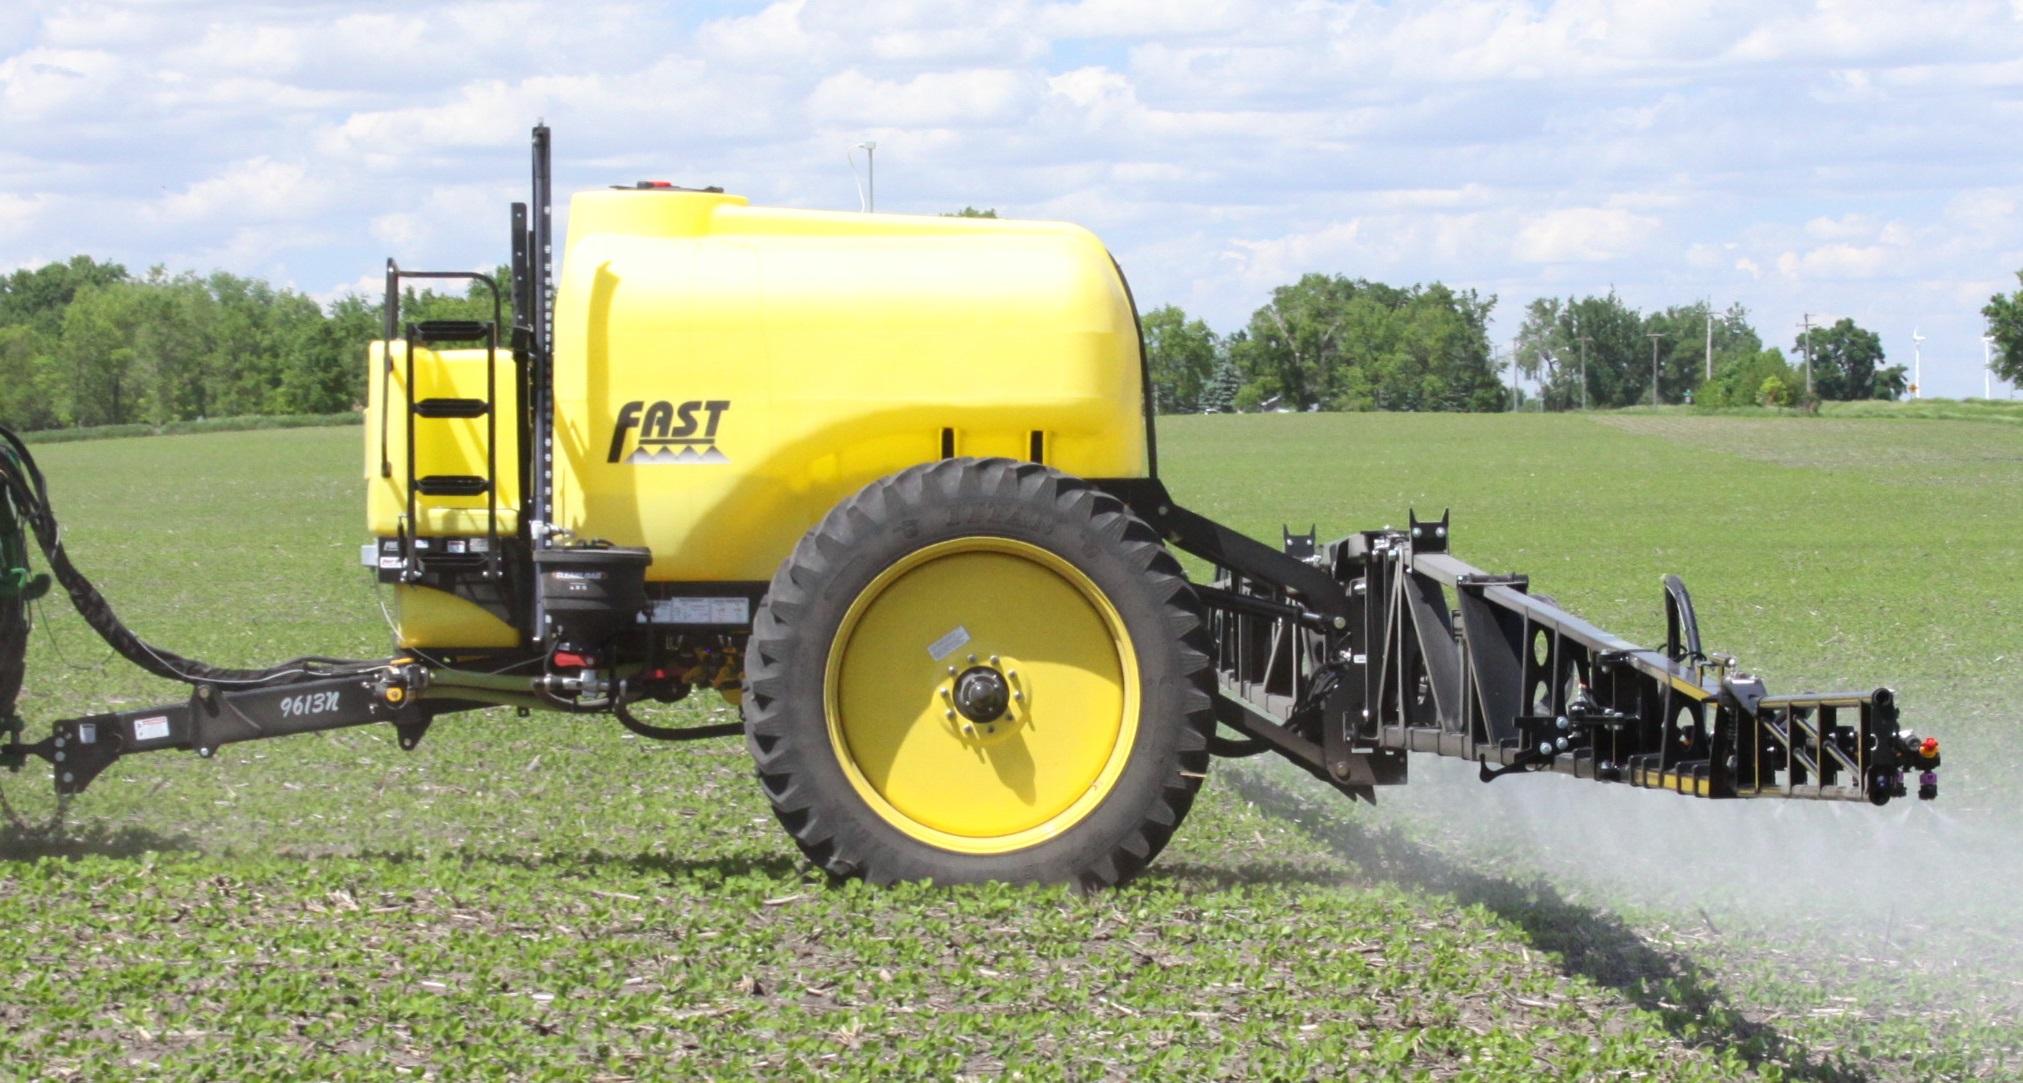 2019 Fast 9613 Pull-Type Sprayer